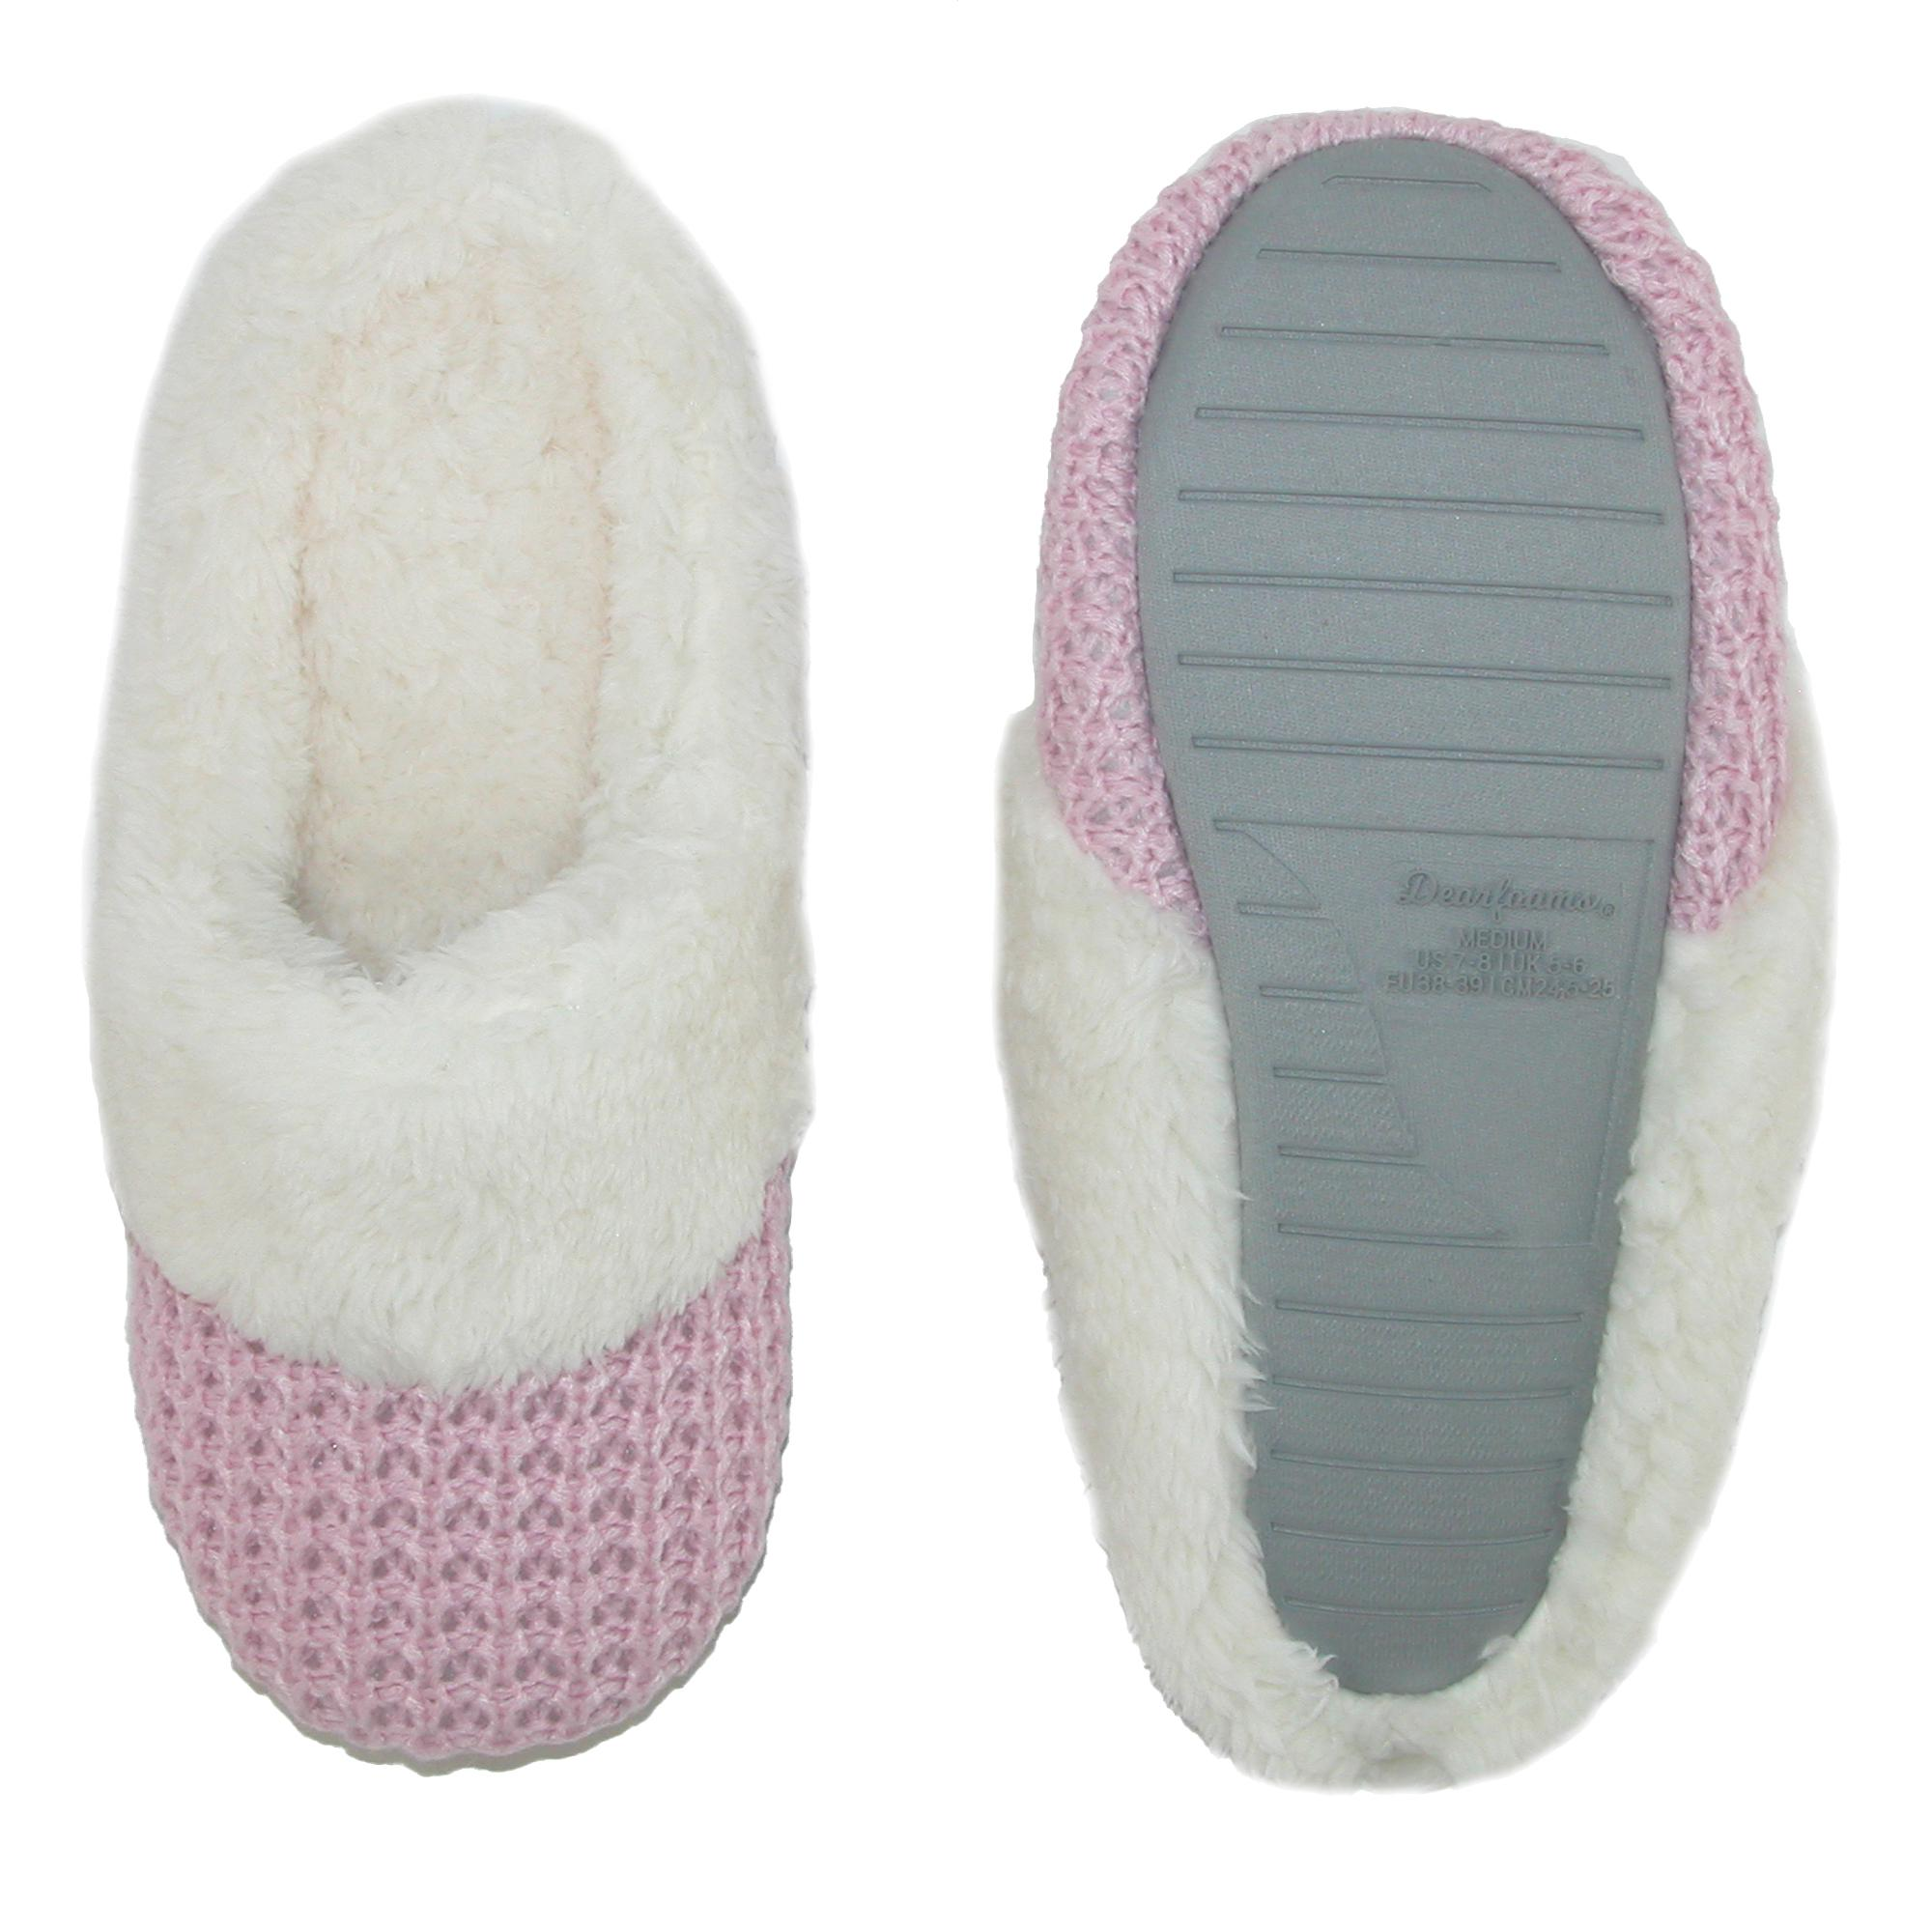 New-Dearfoams-Women-039-s-Sweater-Knit-Closed-Toe-Scuff-Slippers thumbnail 4